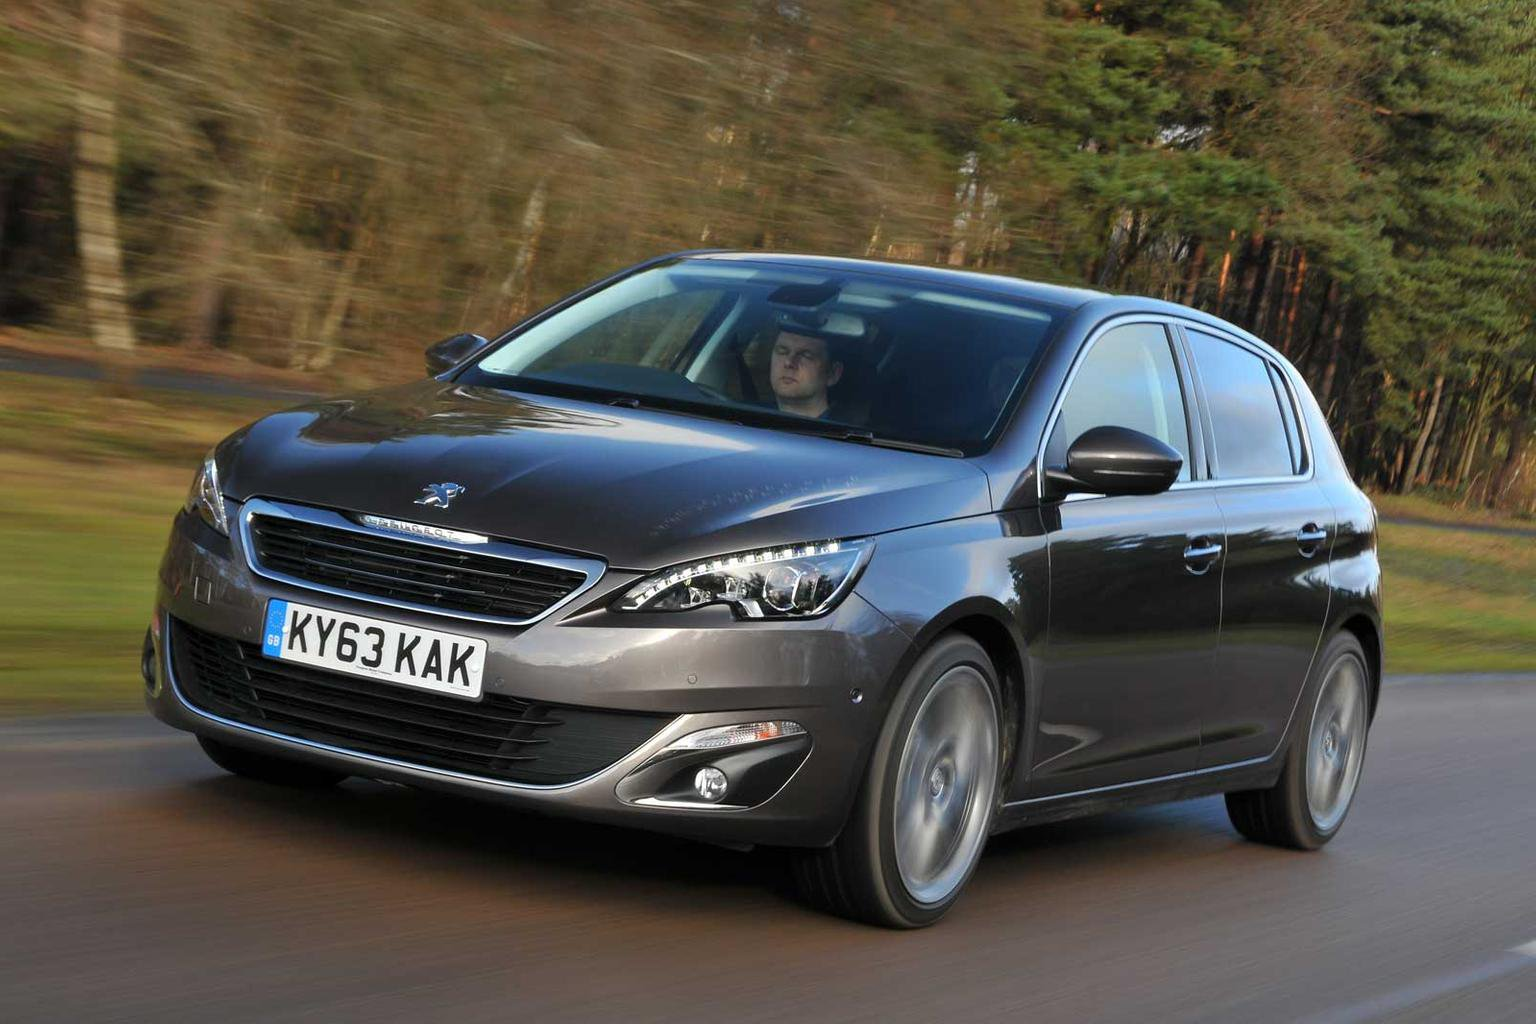 2014 Peugeot 308 2.0 BlueHDi review